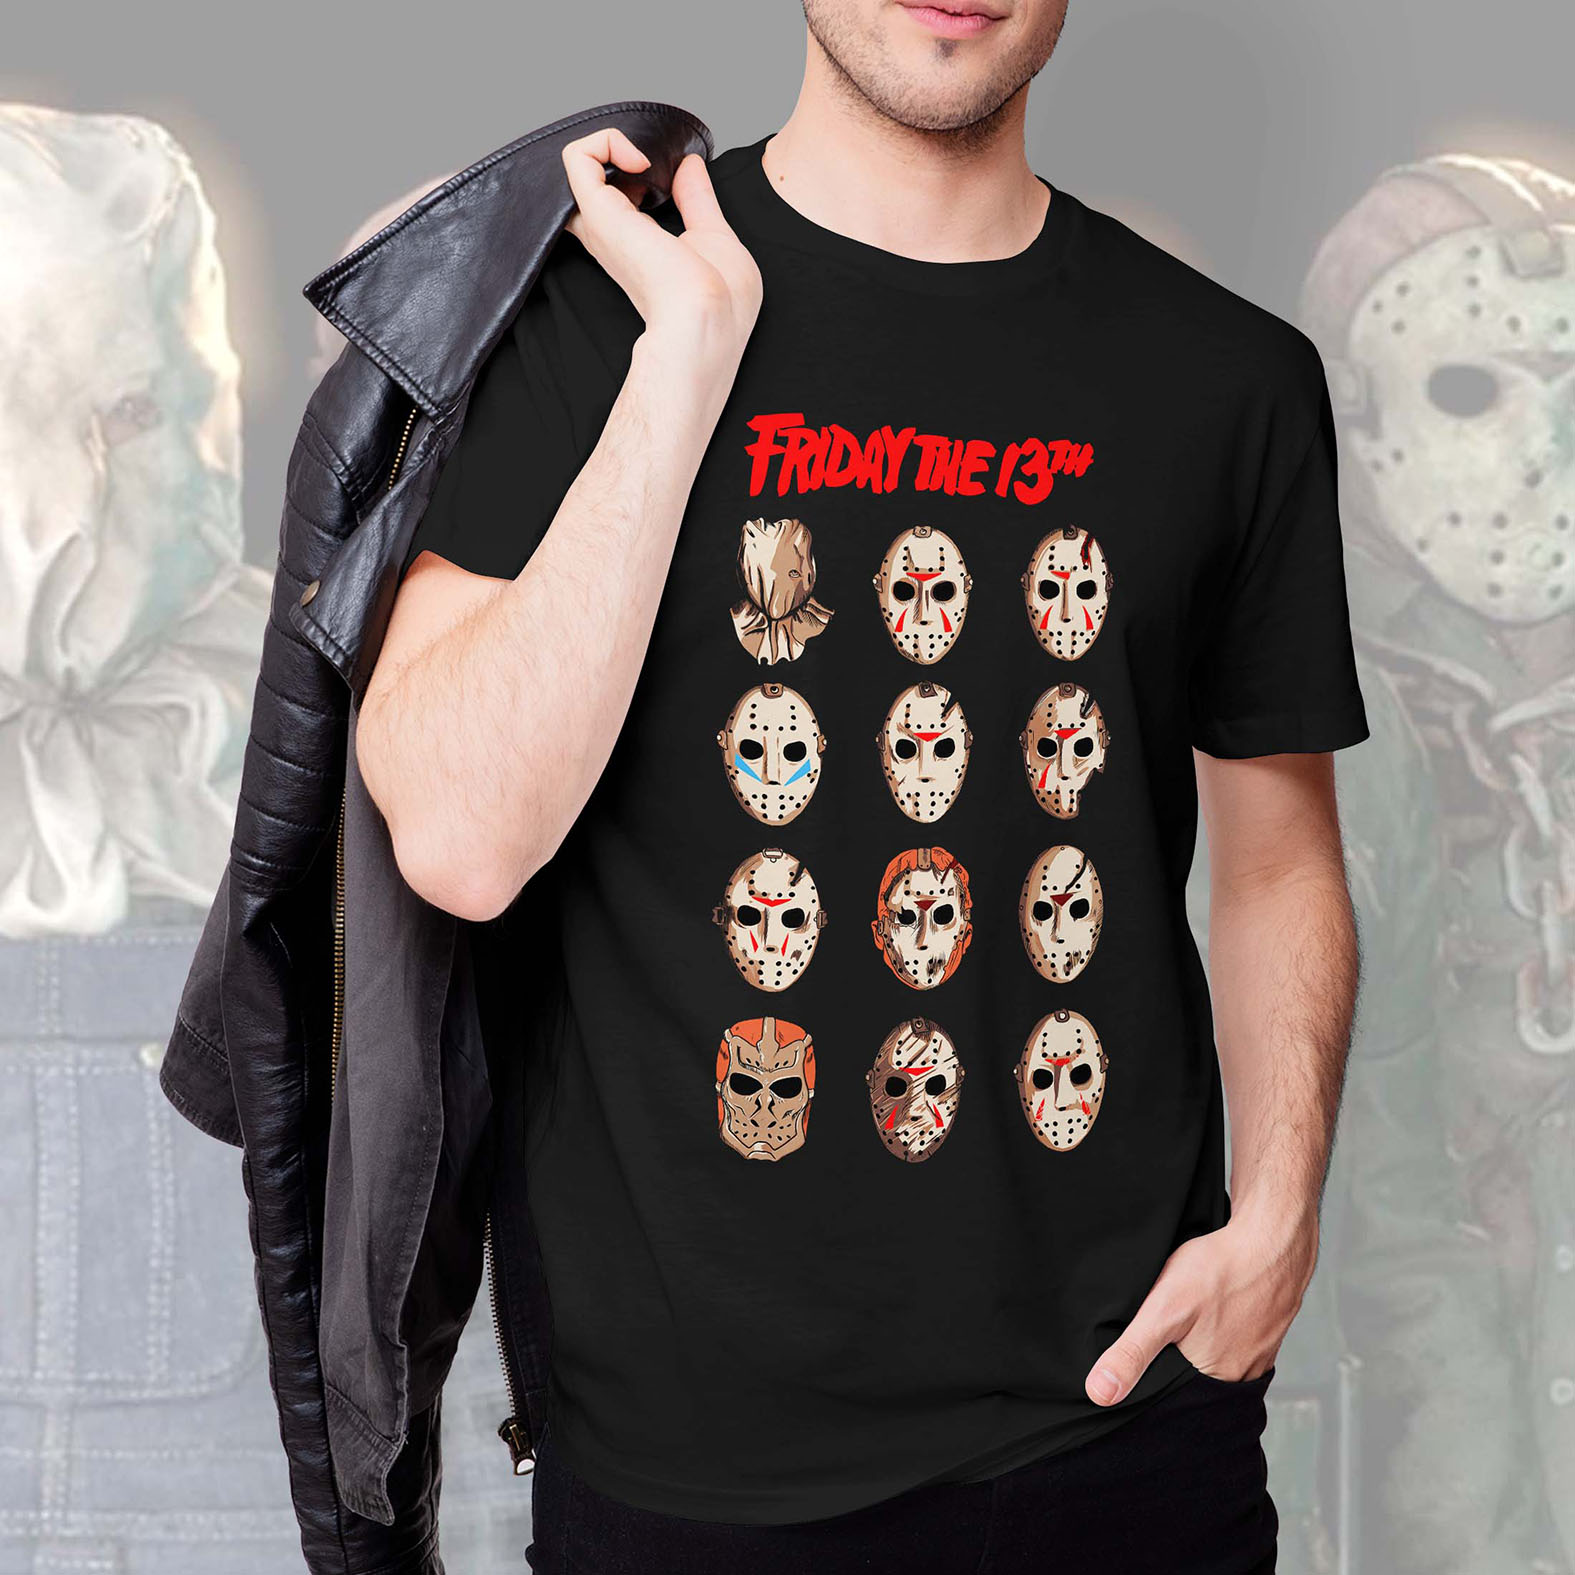 Camiseta Masculina Unissex Jason Voorhees Friday The 13th Sexta Feira 13 Terror Horror Serial Killer (Preta) - EV